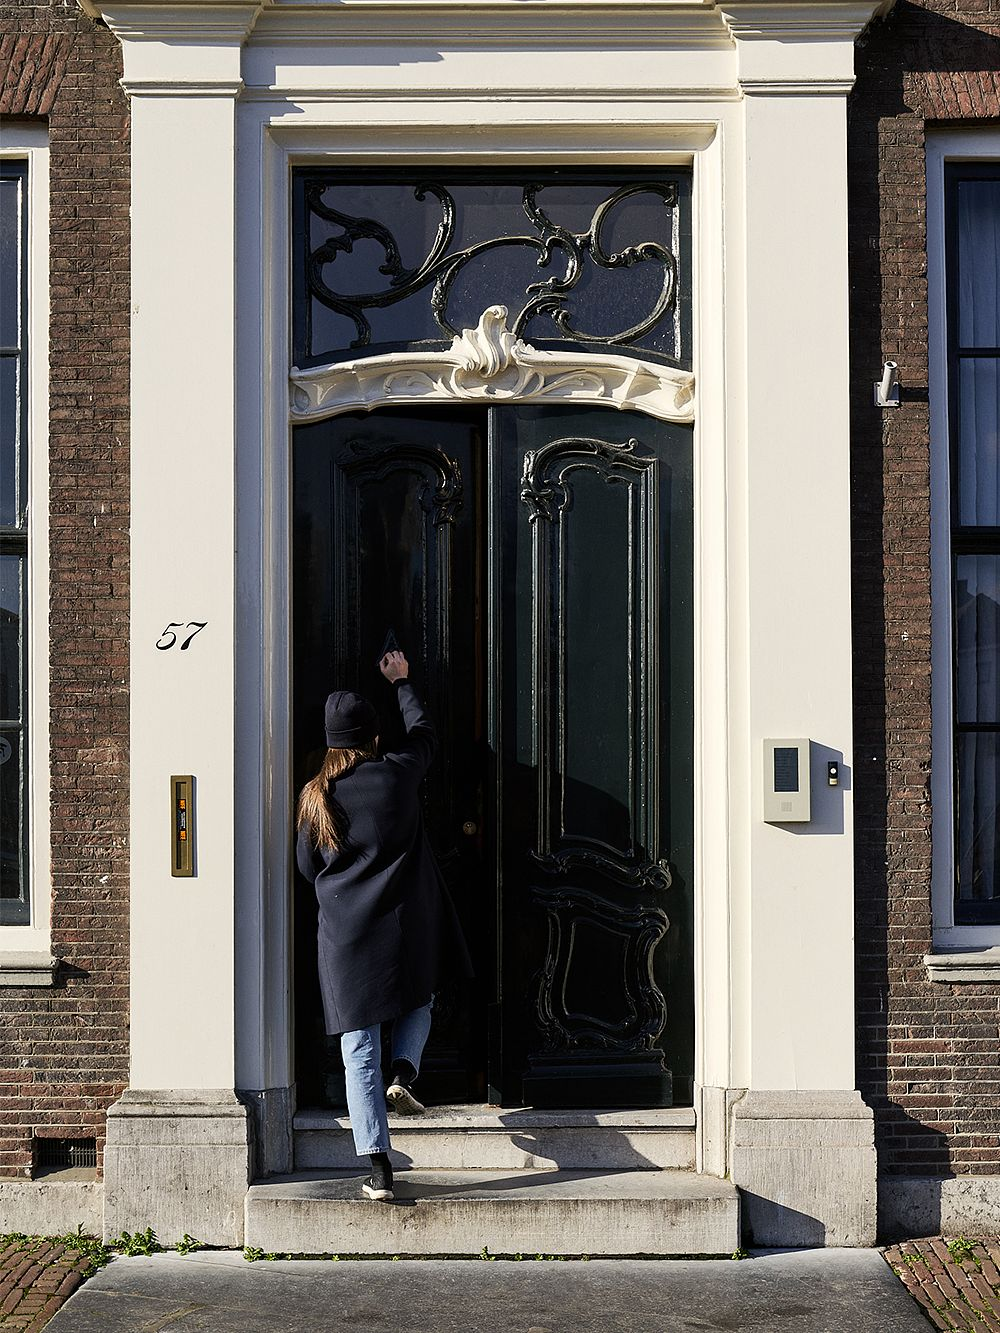 Rachel Griffin on her way to her workspace in Rotterdam.